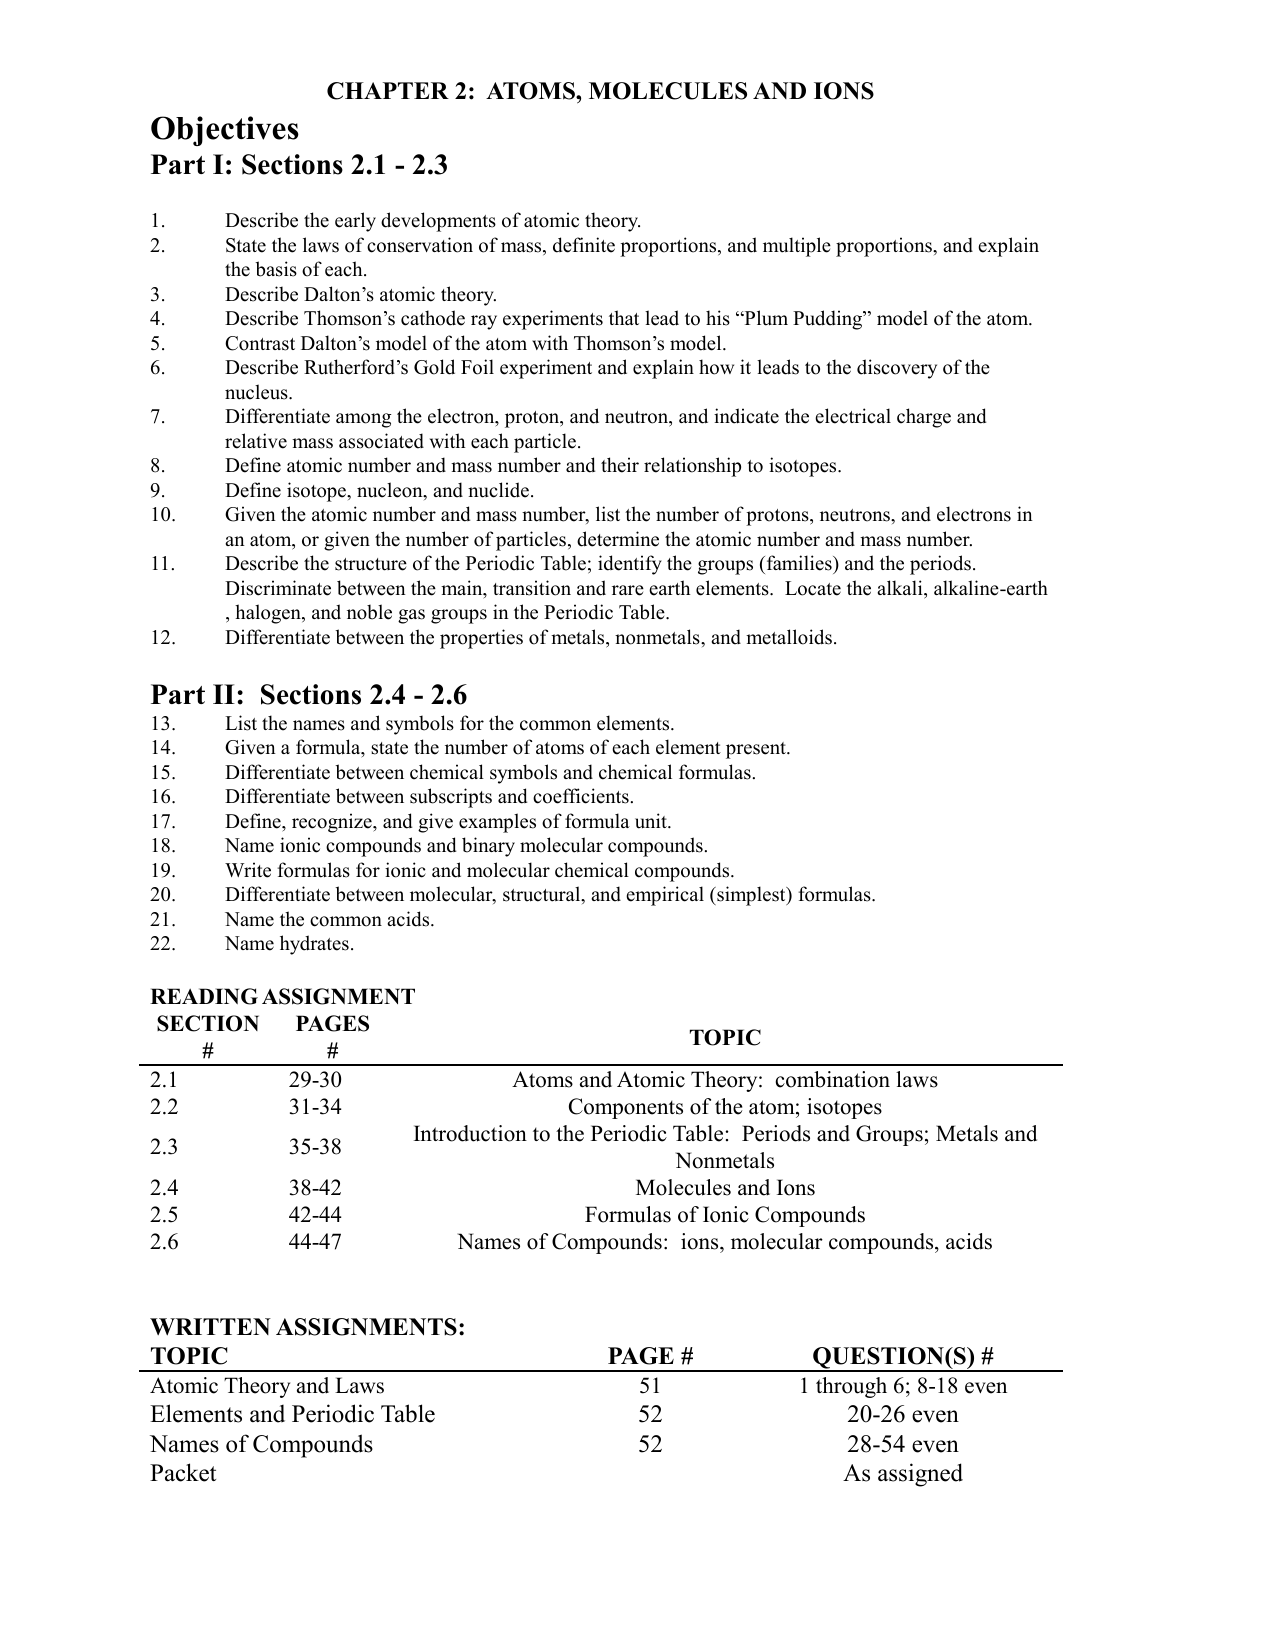 CH 2 Worksheet